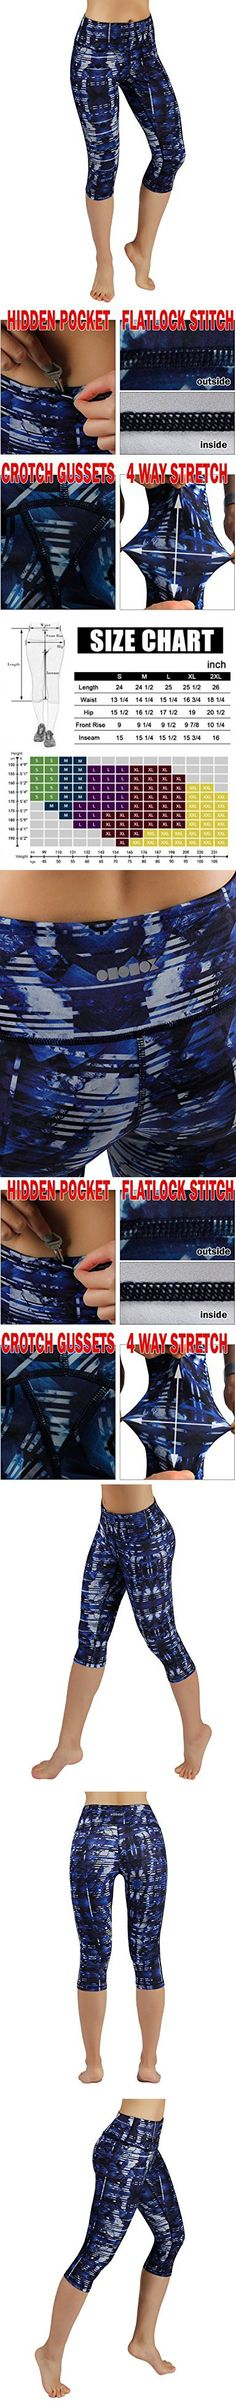 ODODOS by Power Flex Women's Tummy Control Workout Running Printed Capris Yoga Capris Pants With Hidden Pocket ,Indigo, Small